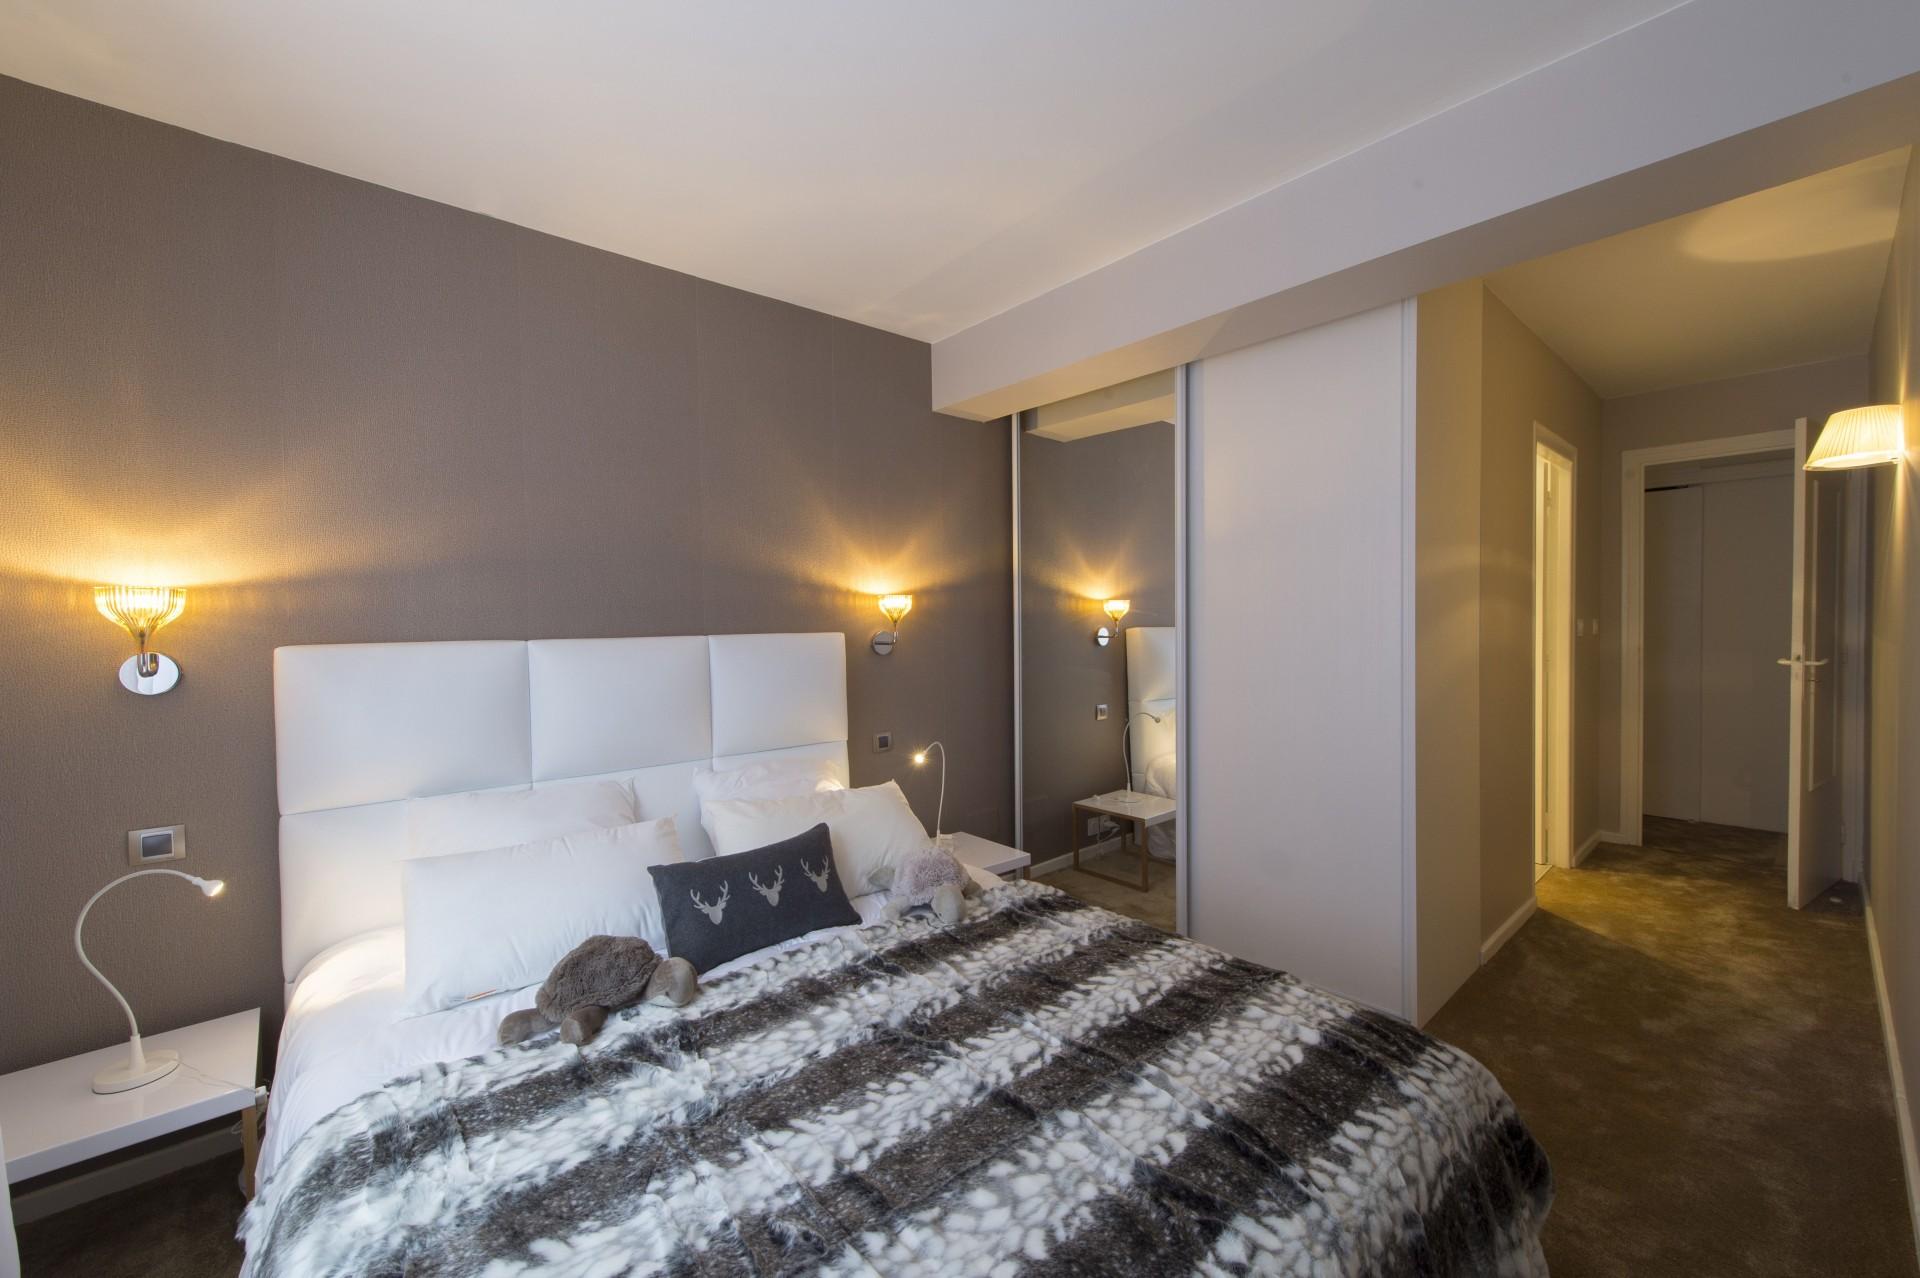 Courchevel 1850 Luxury Rental Appartment Taramite Bedroom 6